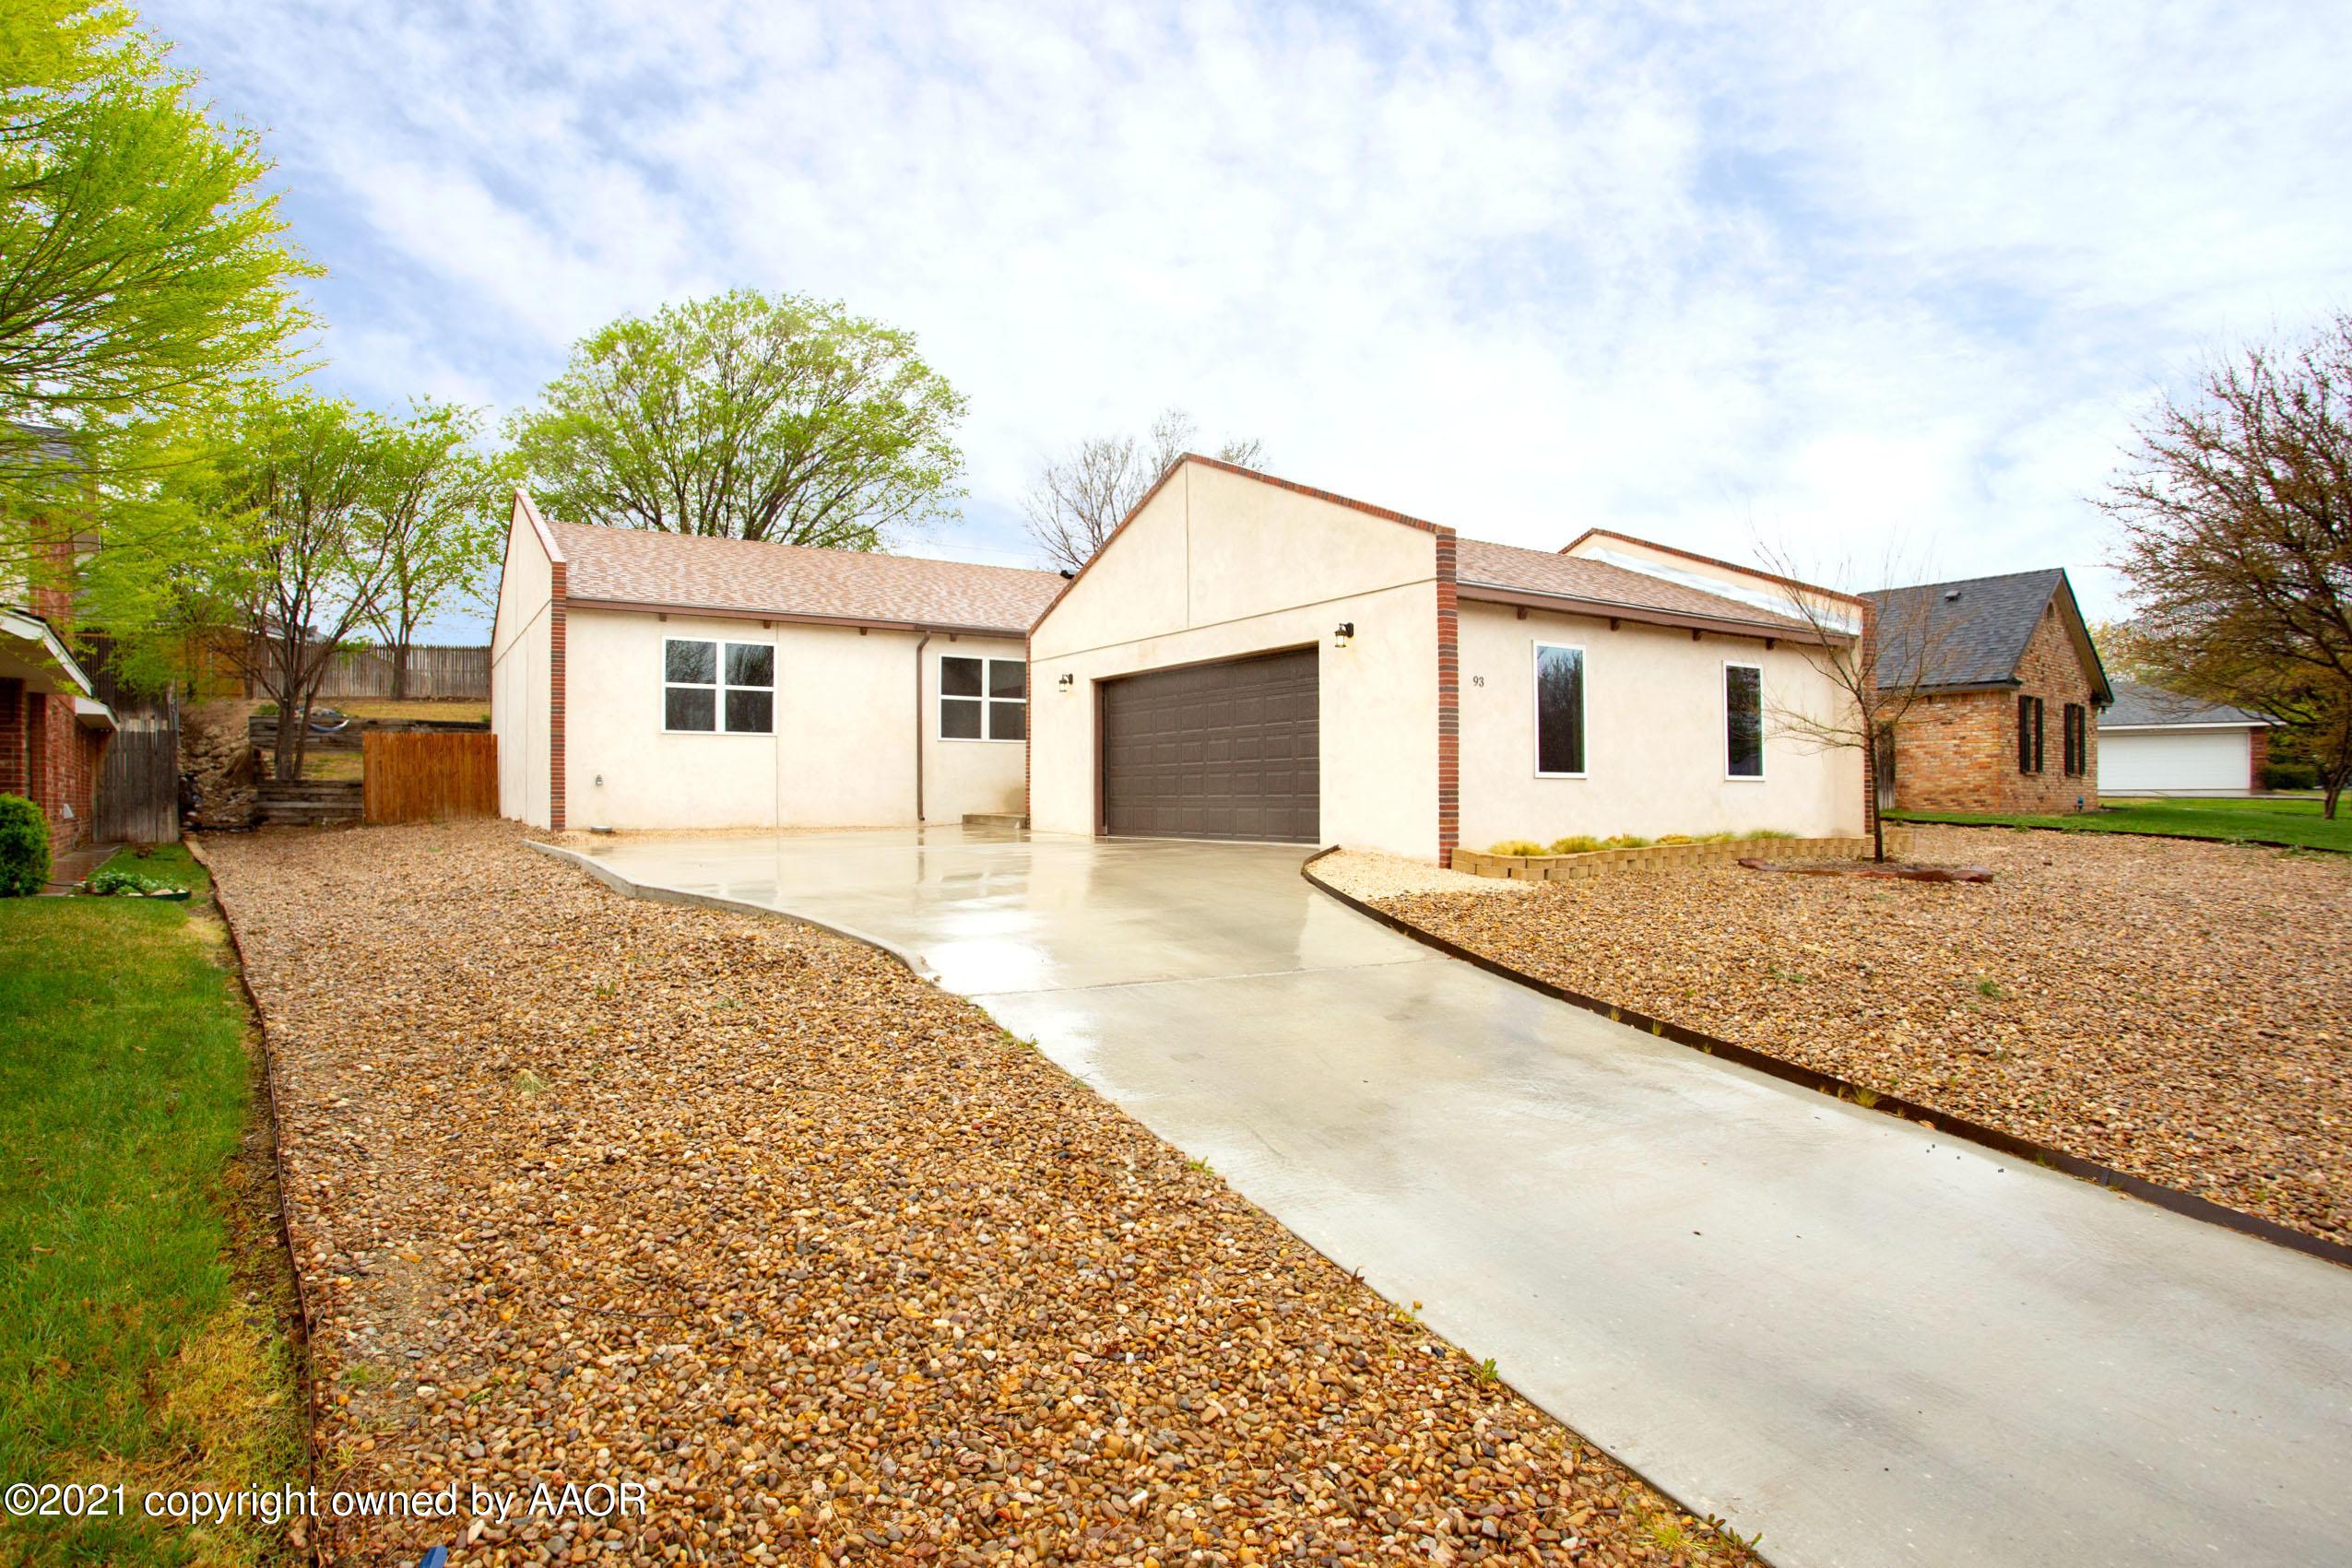 Photo of 93 HUNSLEY HILLS BLVD, Canyon, TX 79015